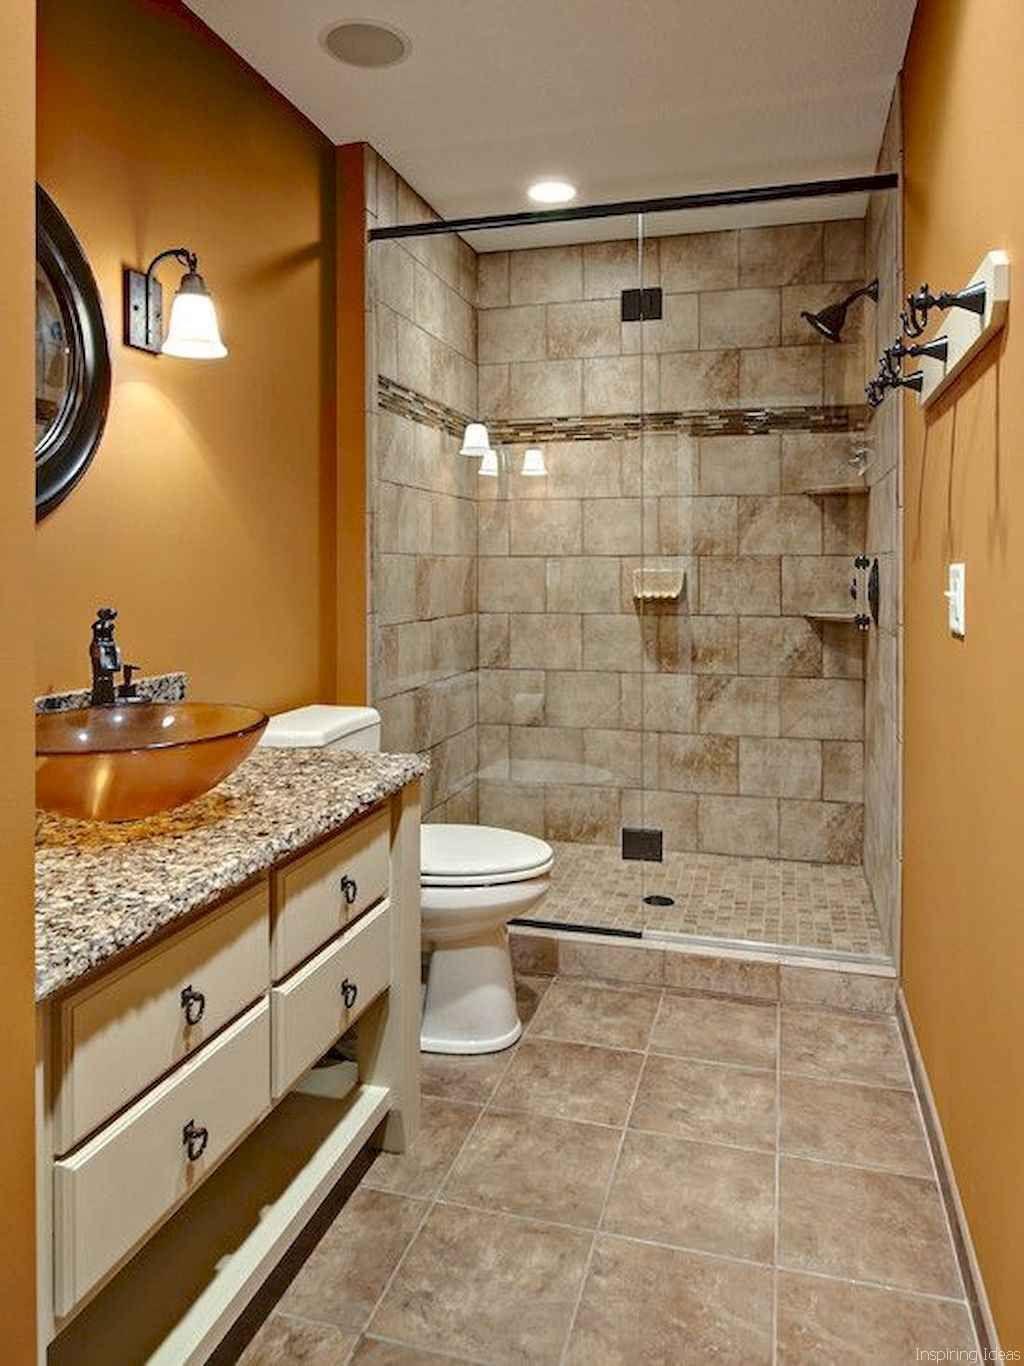 50 smart bathroom shower tile ideas on a budget budget on bathroom renovation ideas on a budget id=81446